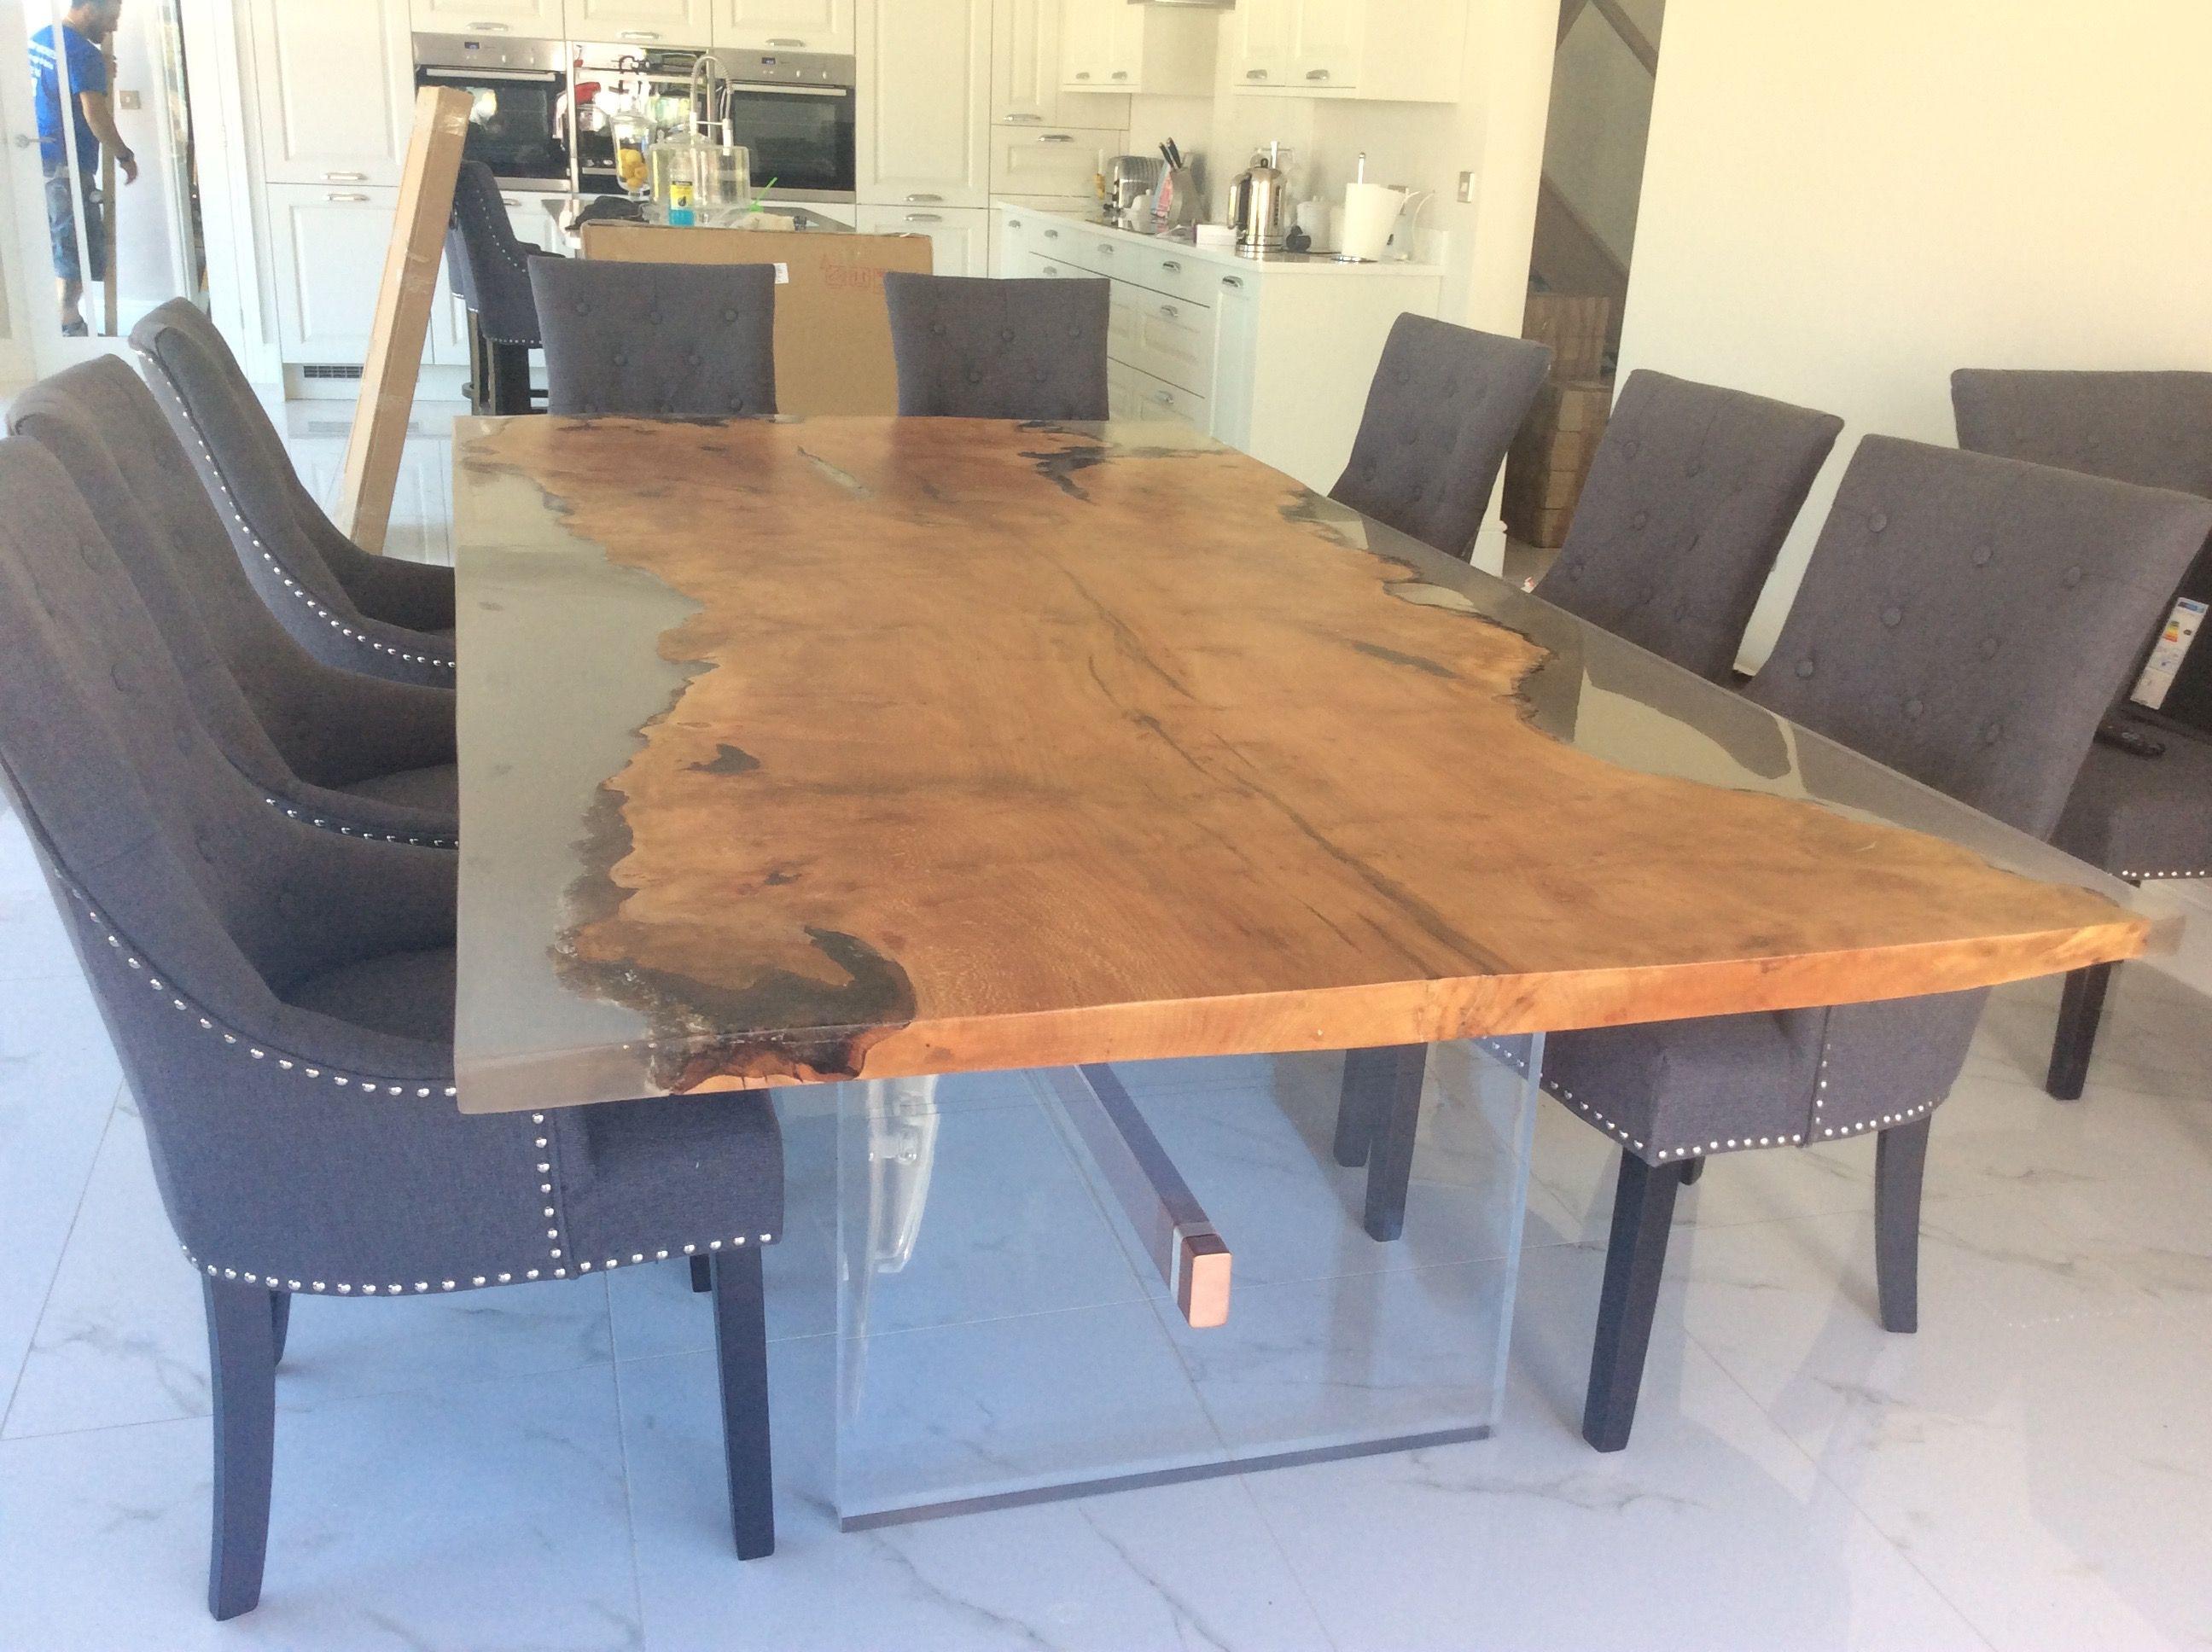 resin tree slice dining table | DINING ROOM IDEAS | Pinterest